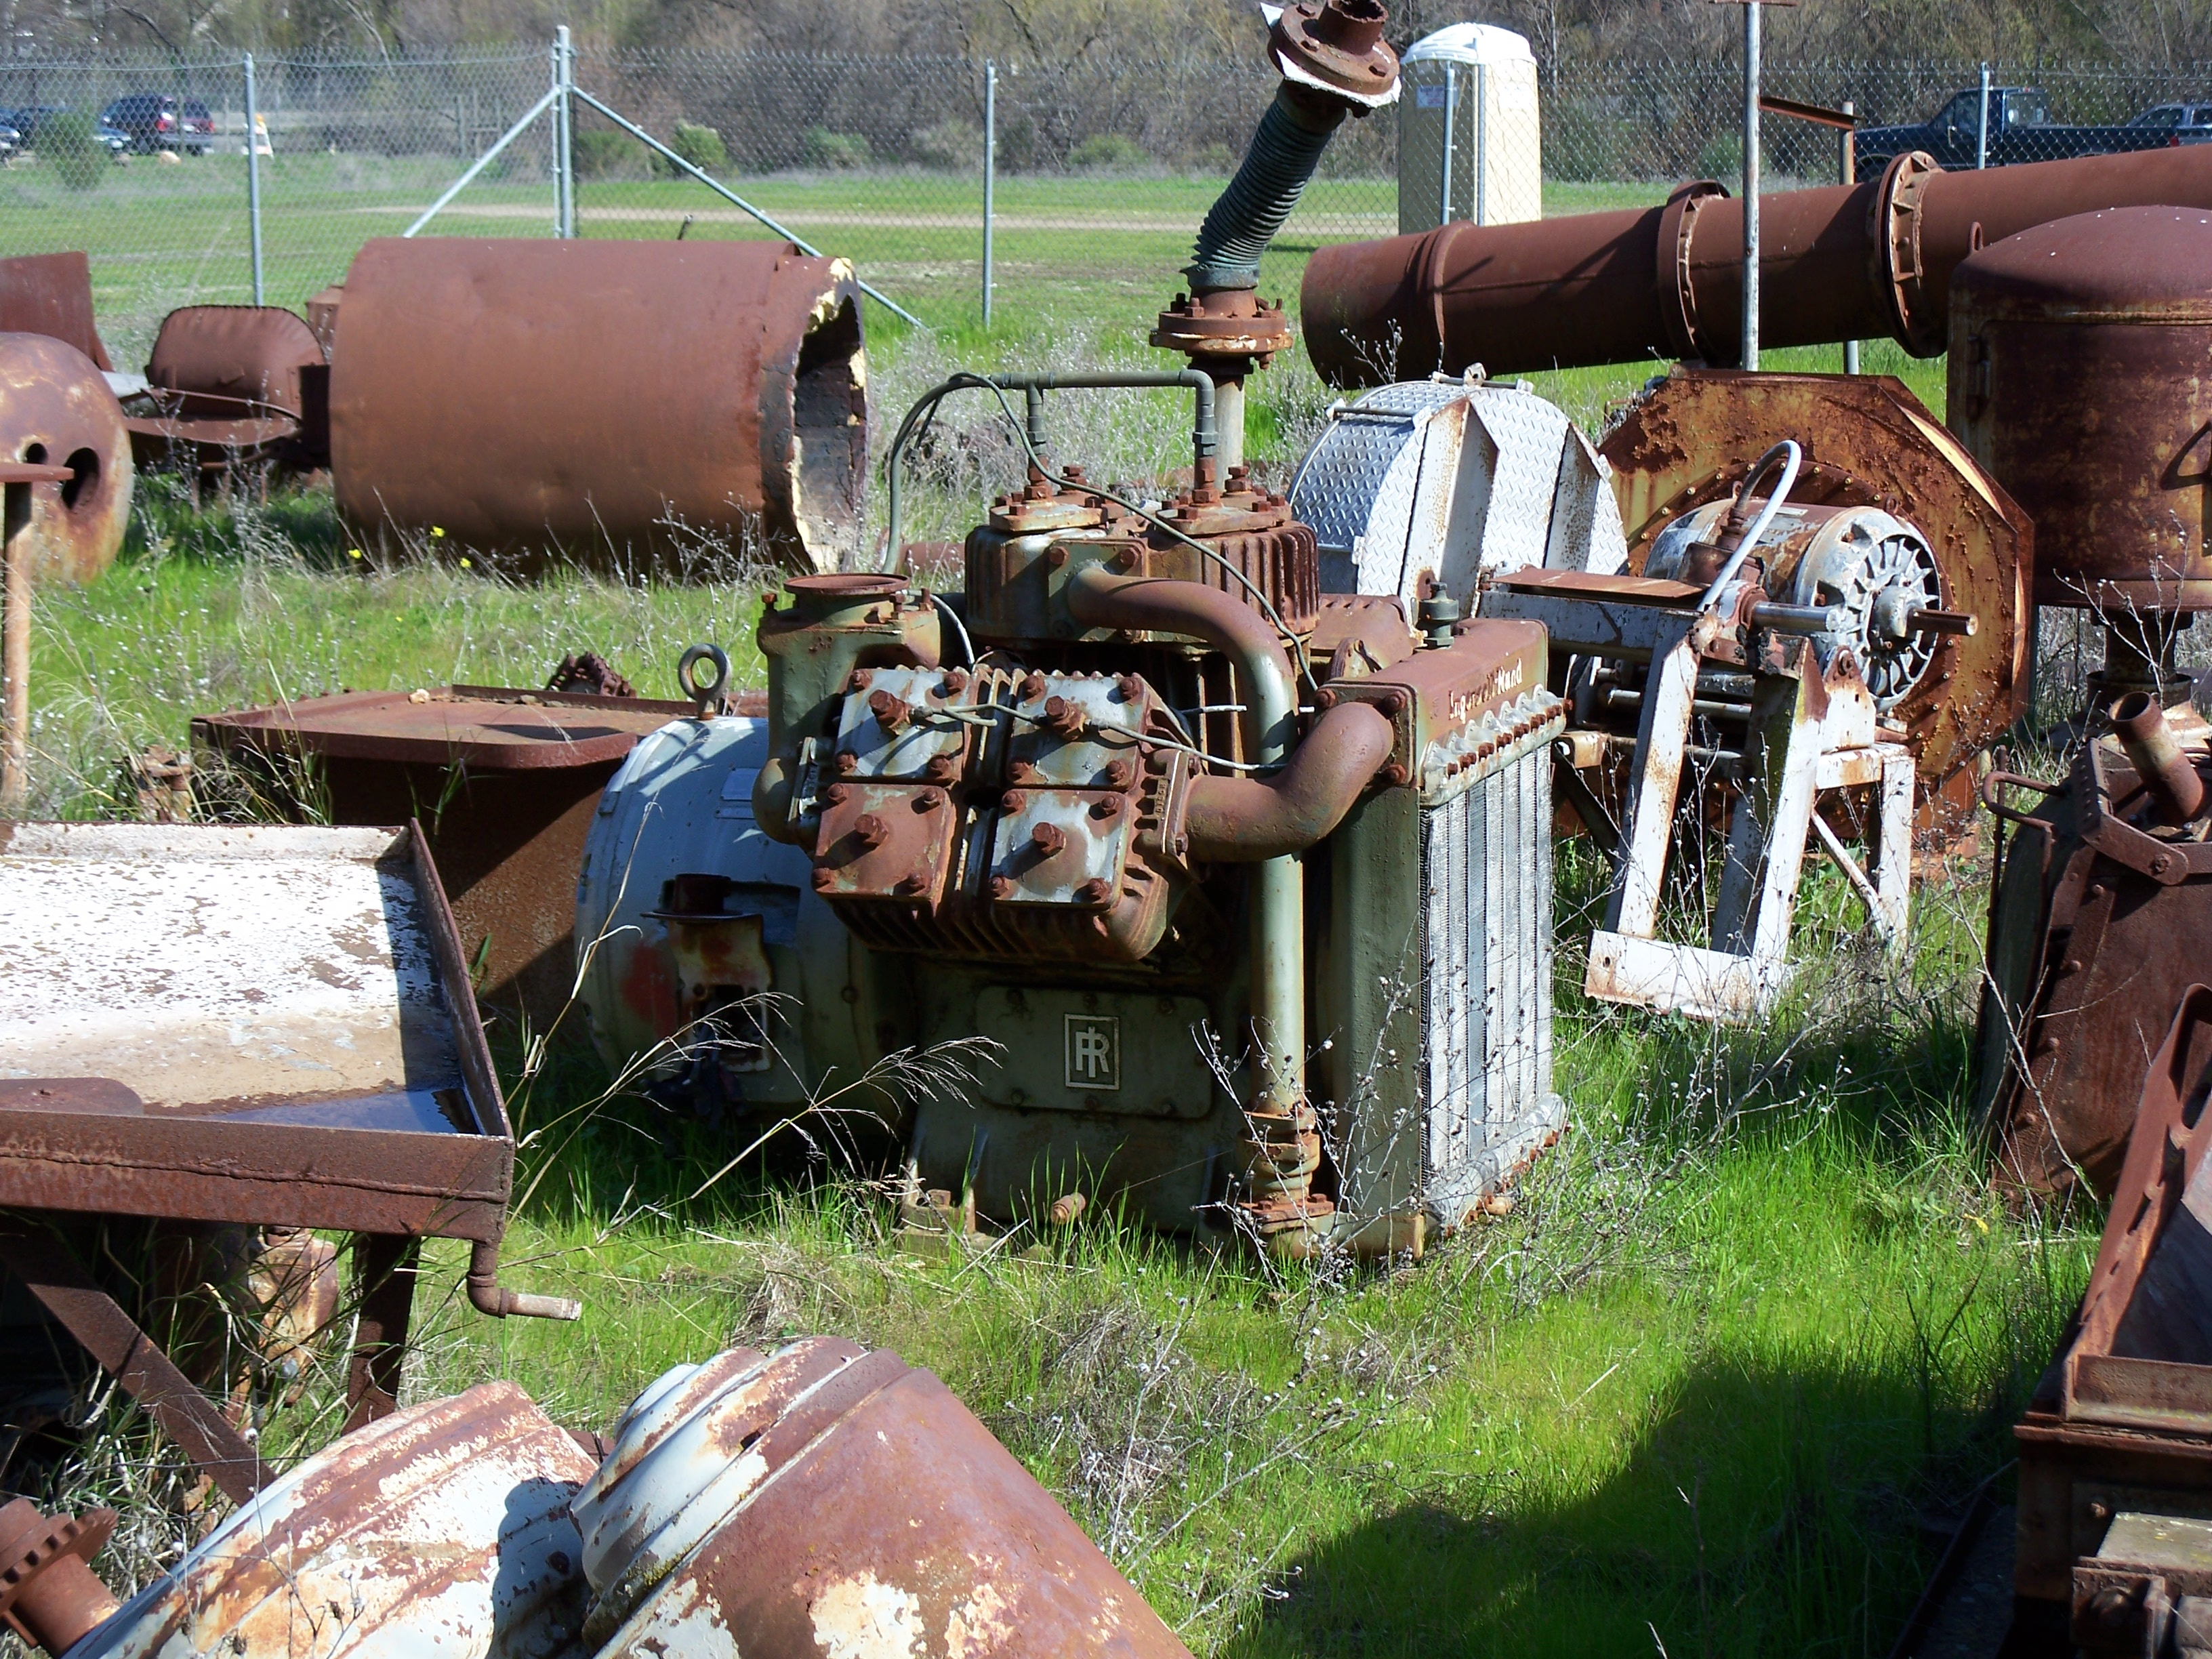 File:USA-San Jose-Almaden Quicksilver Park-Mining Machinery-4.jpg ...